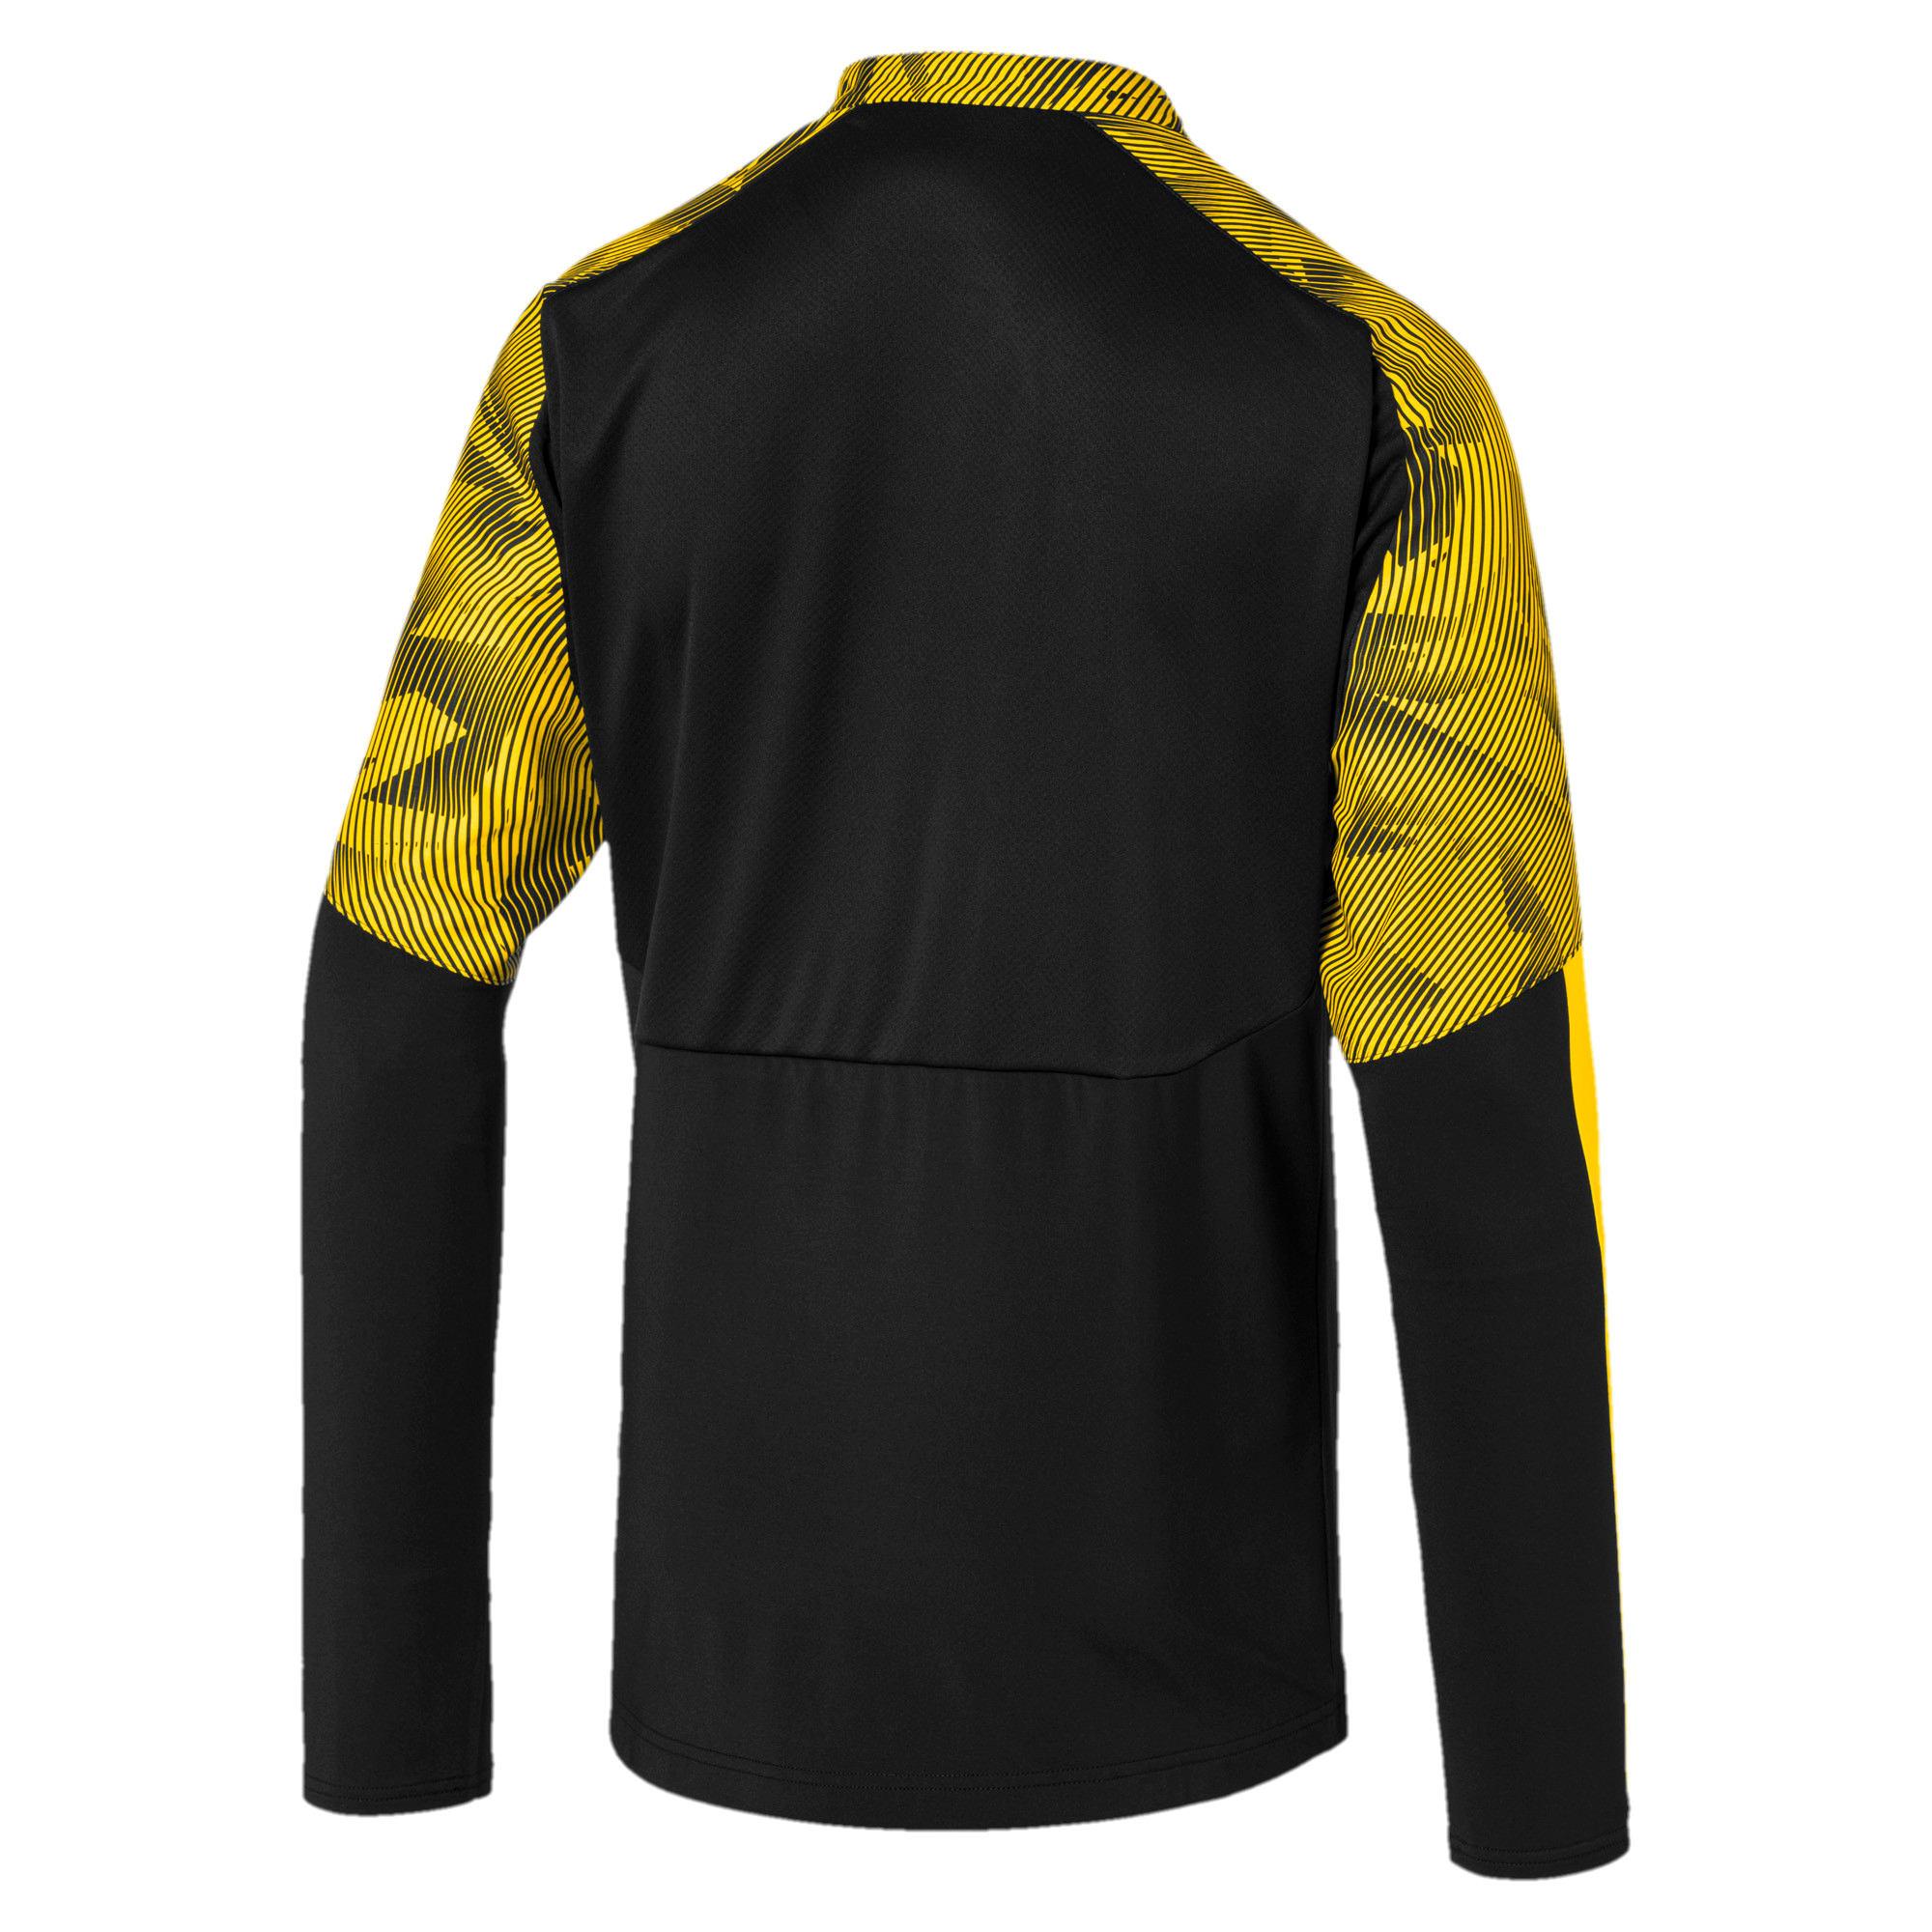 Thumbnail 5 of BVB Men's 1/4 Zip Training Top, Puma Black-Cyber Yellow, medium